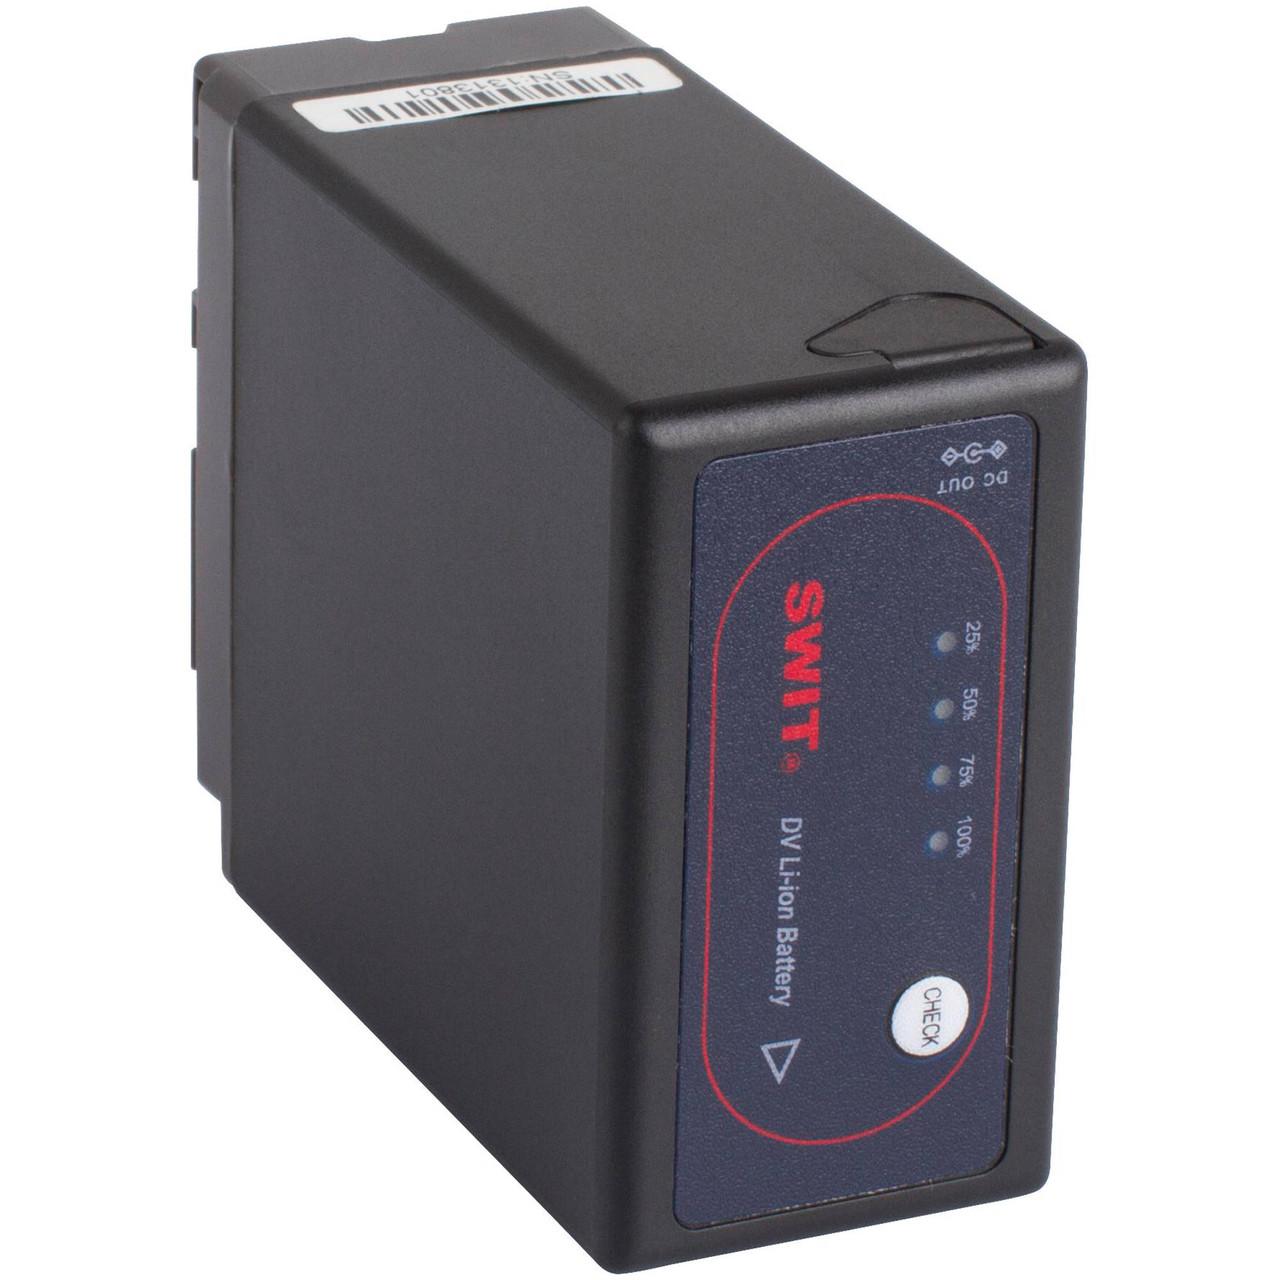 Аккумулятор SWIT S-8BG6 7.2V, 36Wh Replacement Lithium-Ion DV with DC Output for Panasonic VW-VBG6 (S-8BG6)